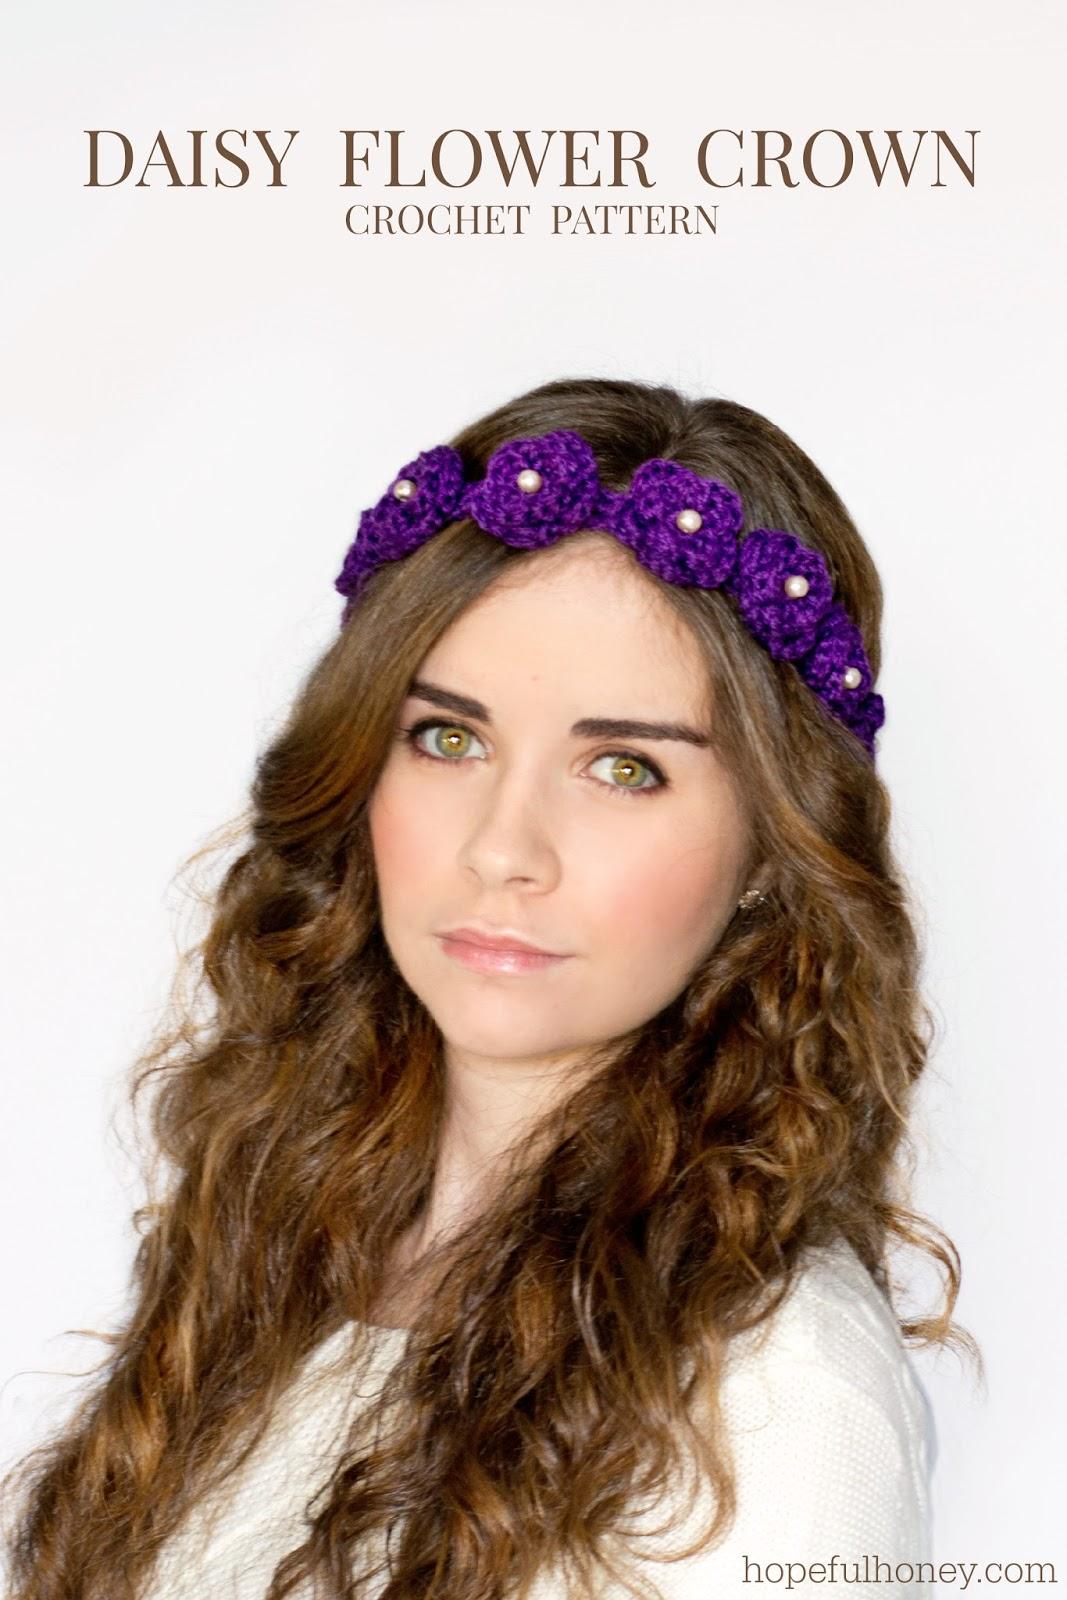 Crochet Flower Crown Tutorial : Hopeful Honey Craft, Crochet, Create: Daisy Flower Crown ...